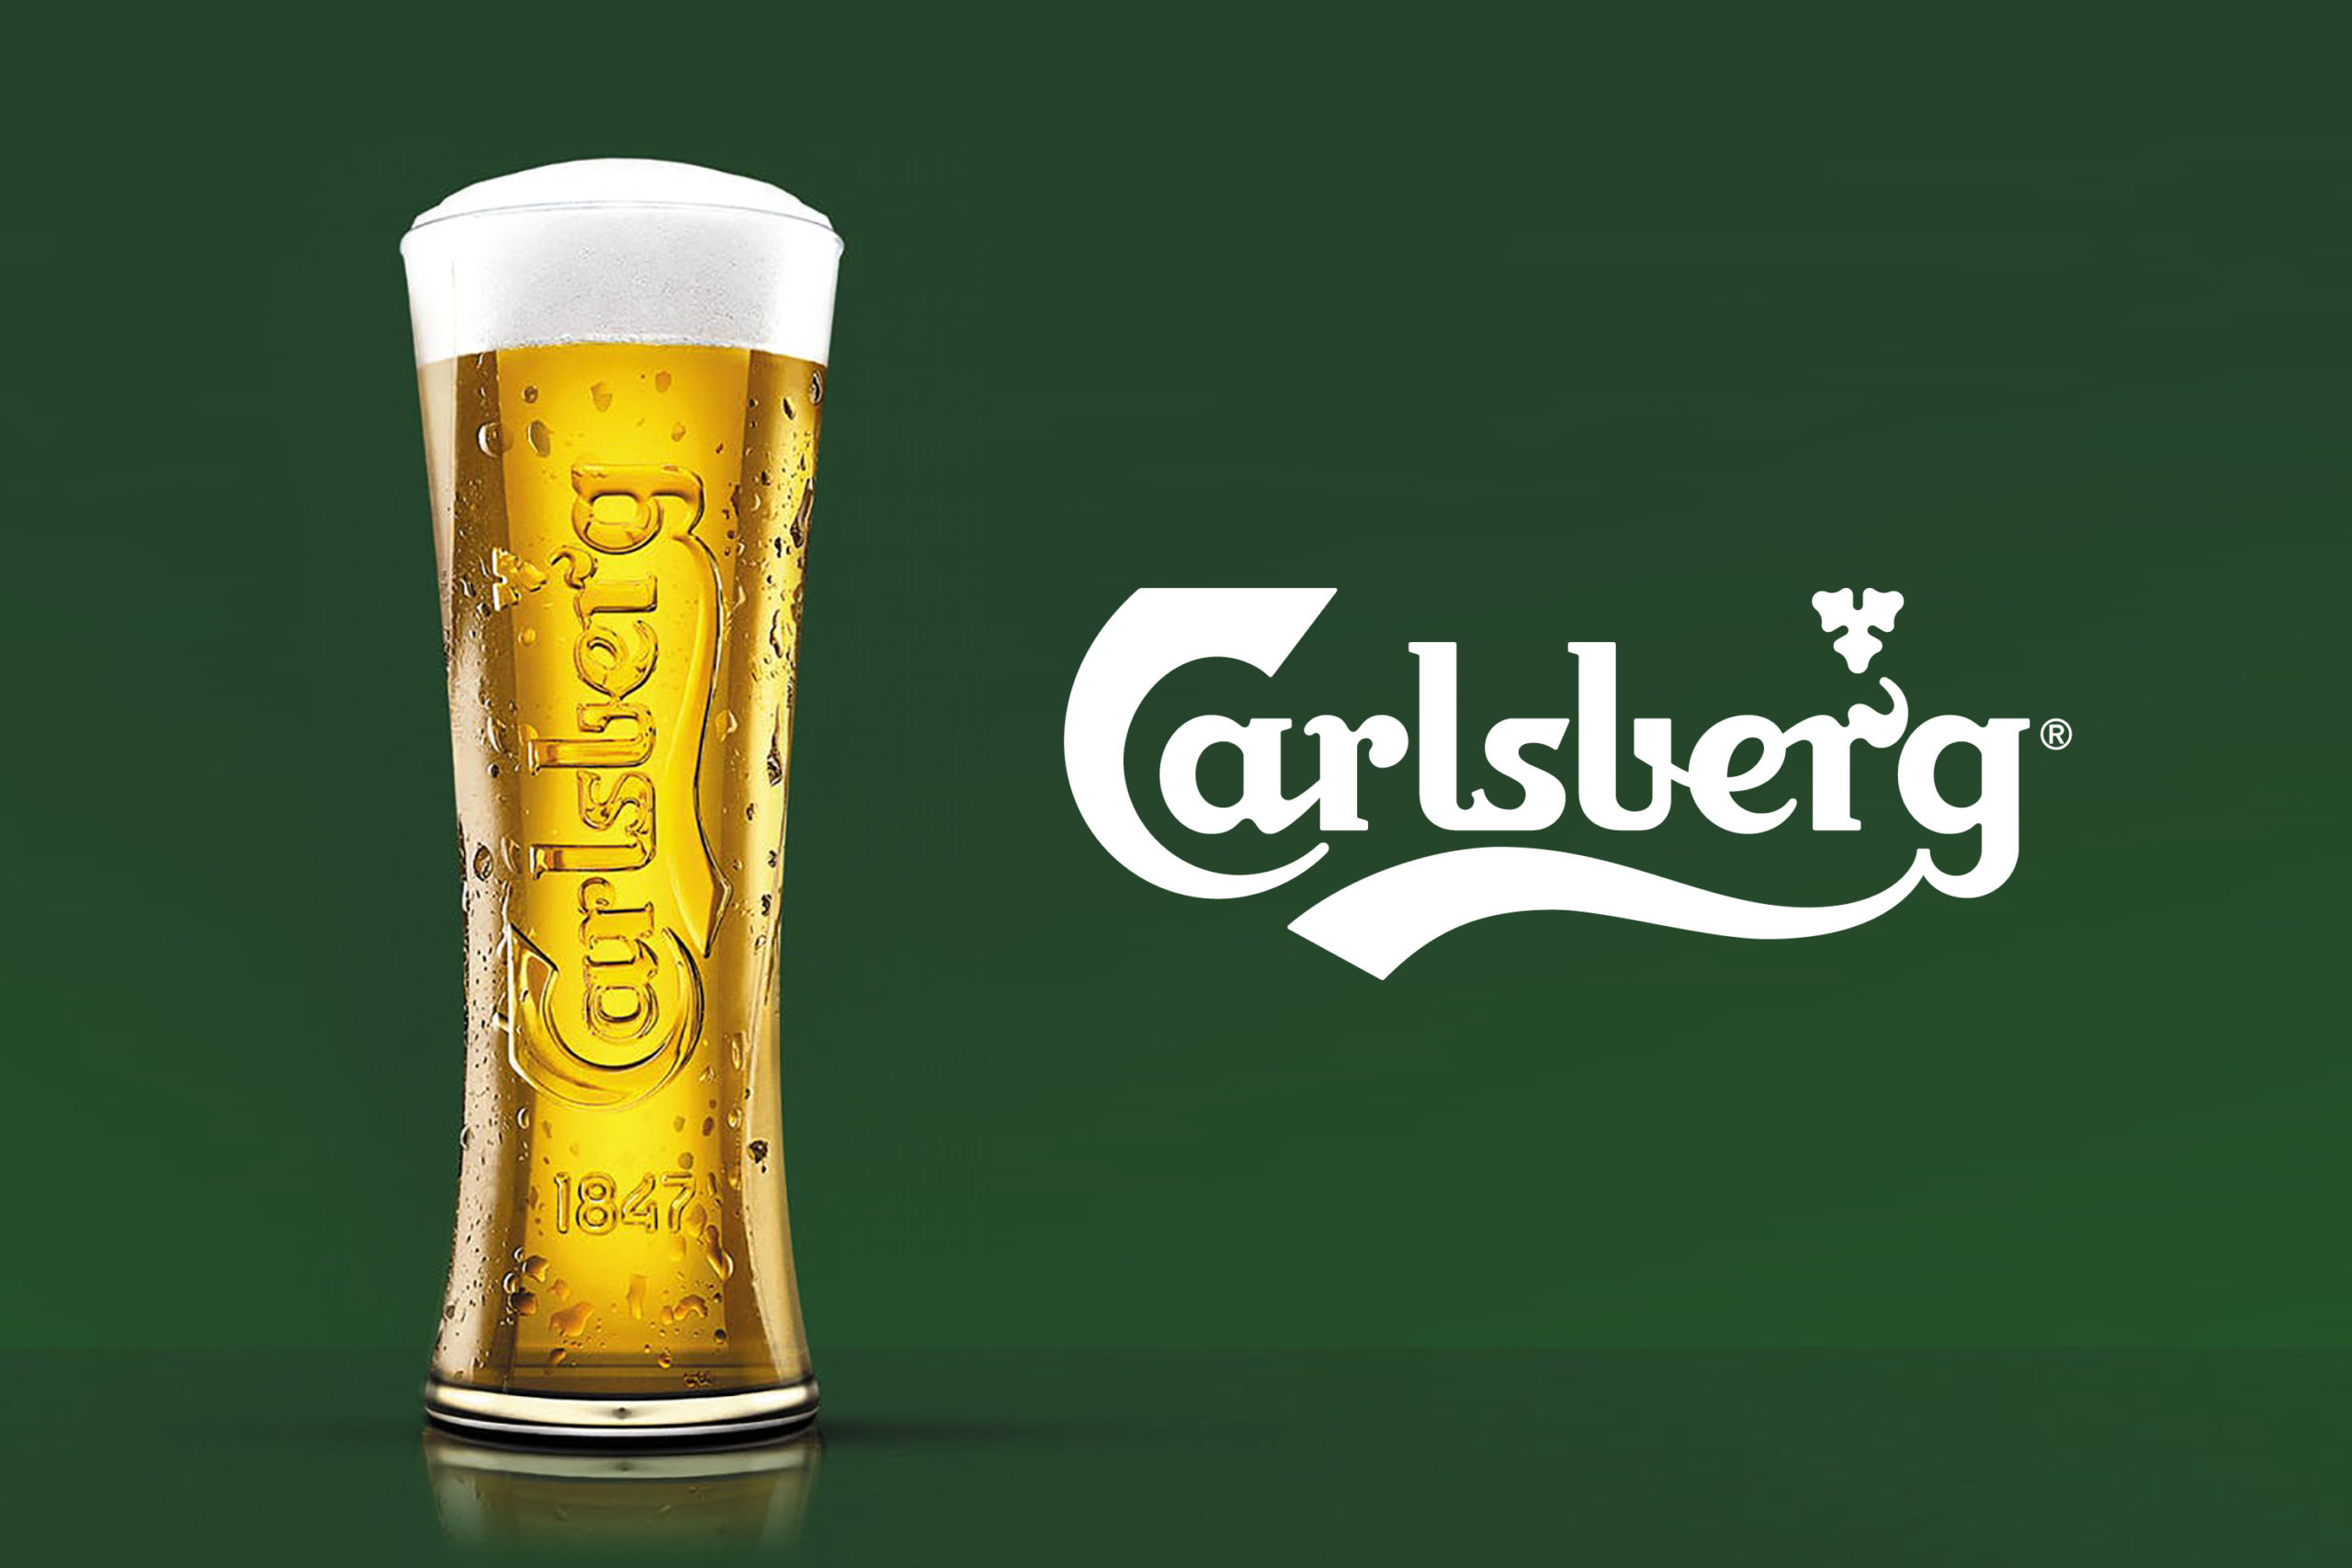 https://www.milkbar.jp/wp/wp-content/uploads/2020/08/drink_carlsberg-1-scaled.jpg